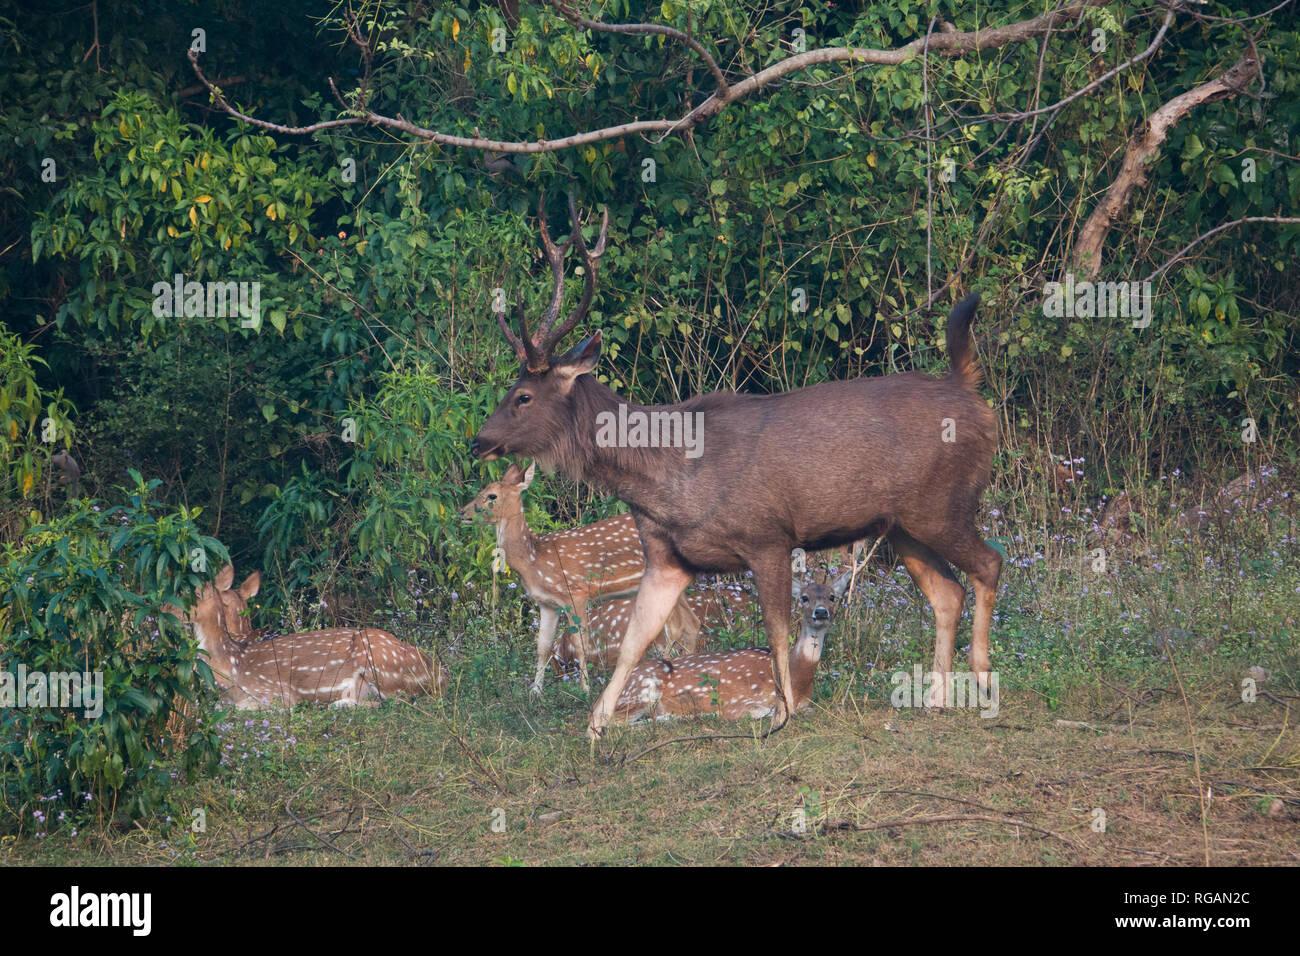 Large sambar deer walks past spotted deer in Rajaji National Park in Uttarakhand, India - Stock Image